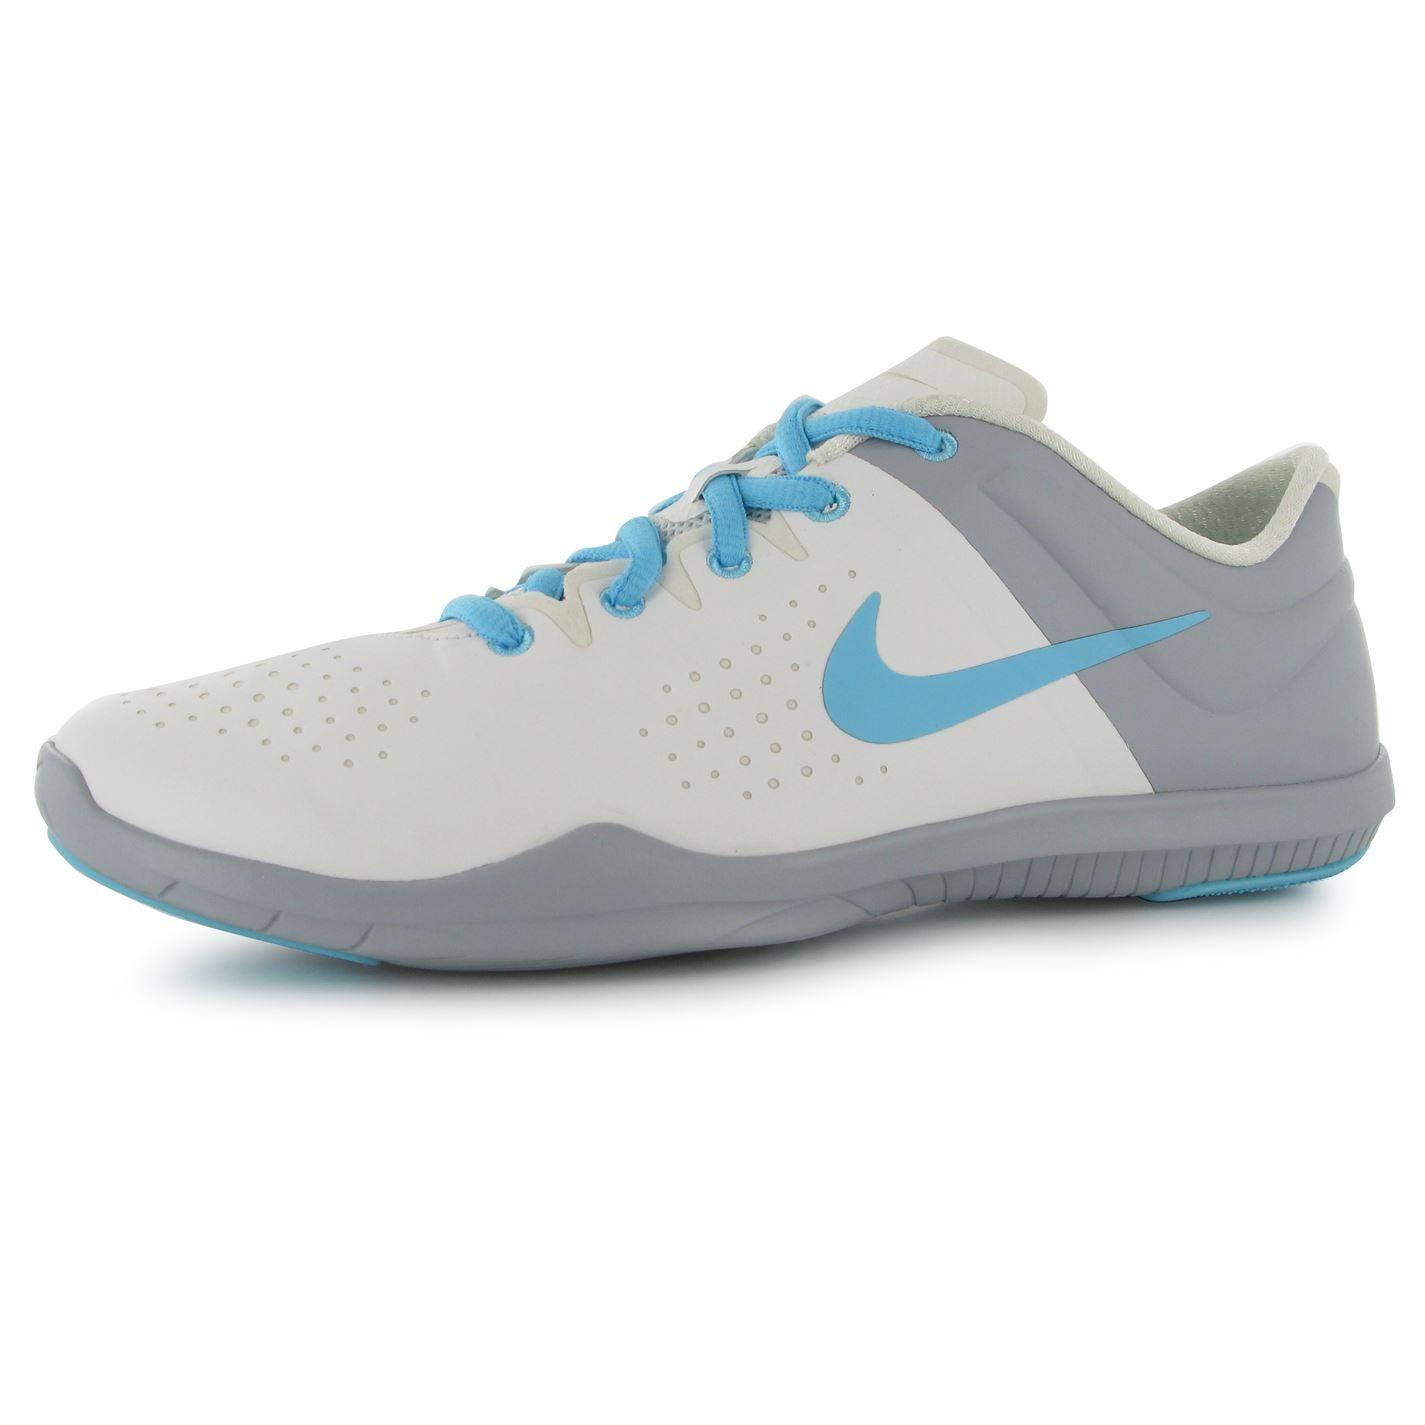 Nike Studio Ladies Training Shoes